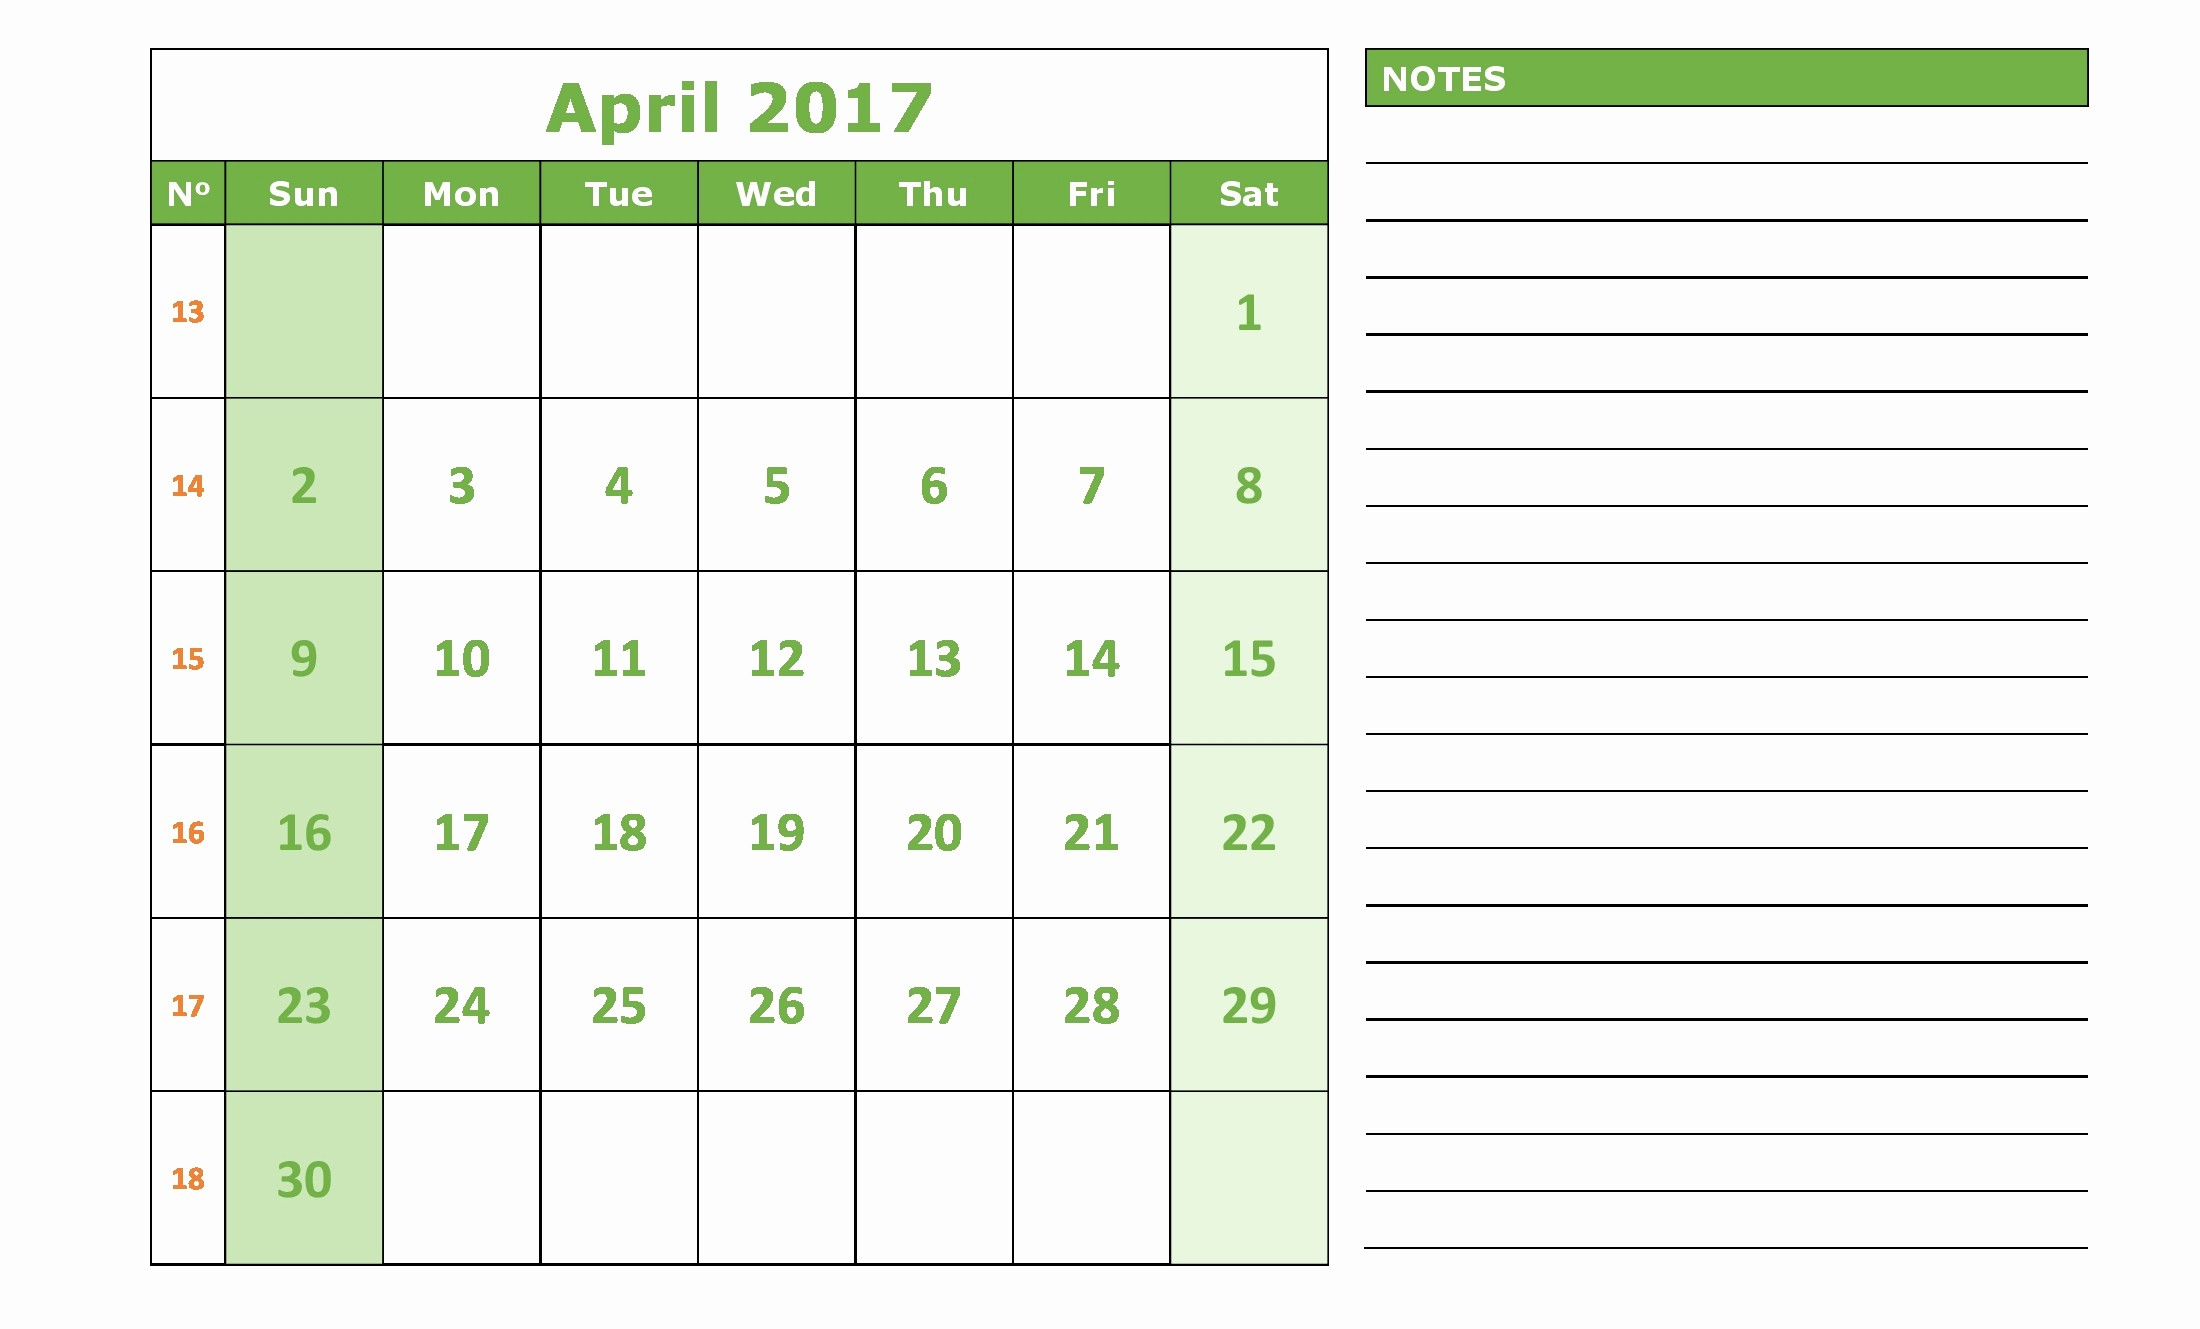 Monday to Sunday Calendar 2017 Fresh April 2017 Calendar Monday to Sunday Calendar and